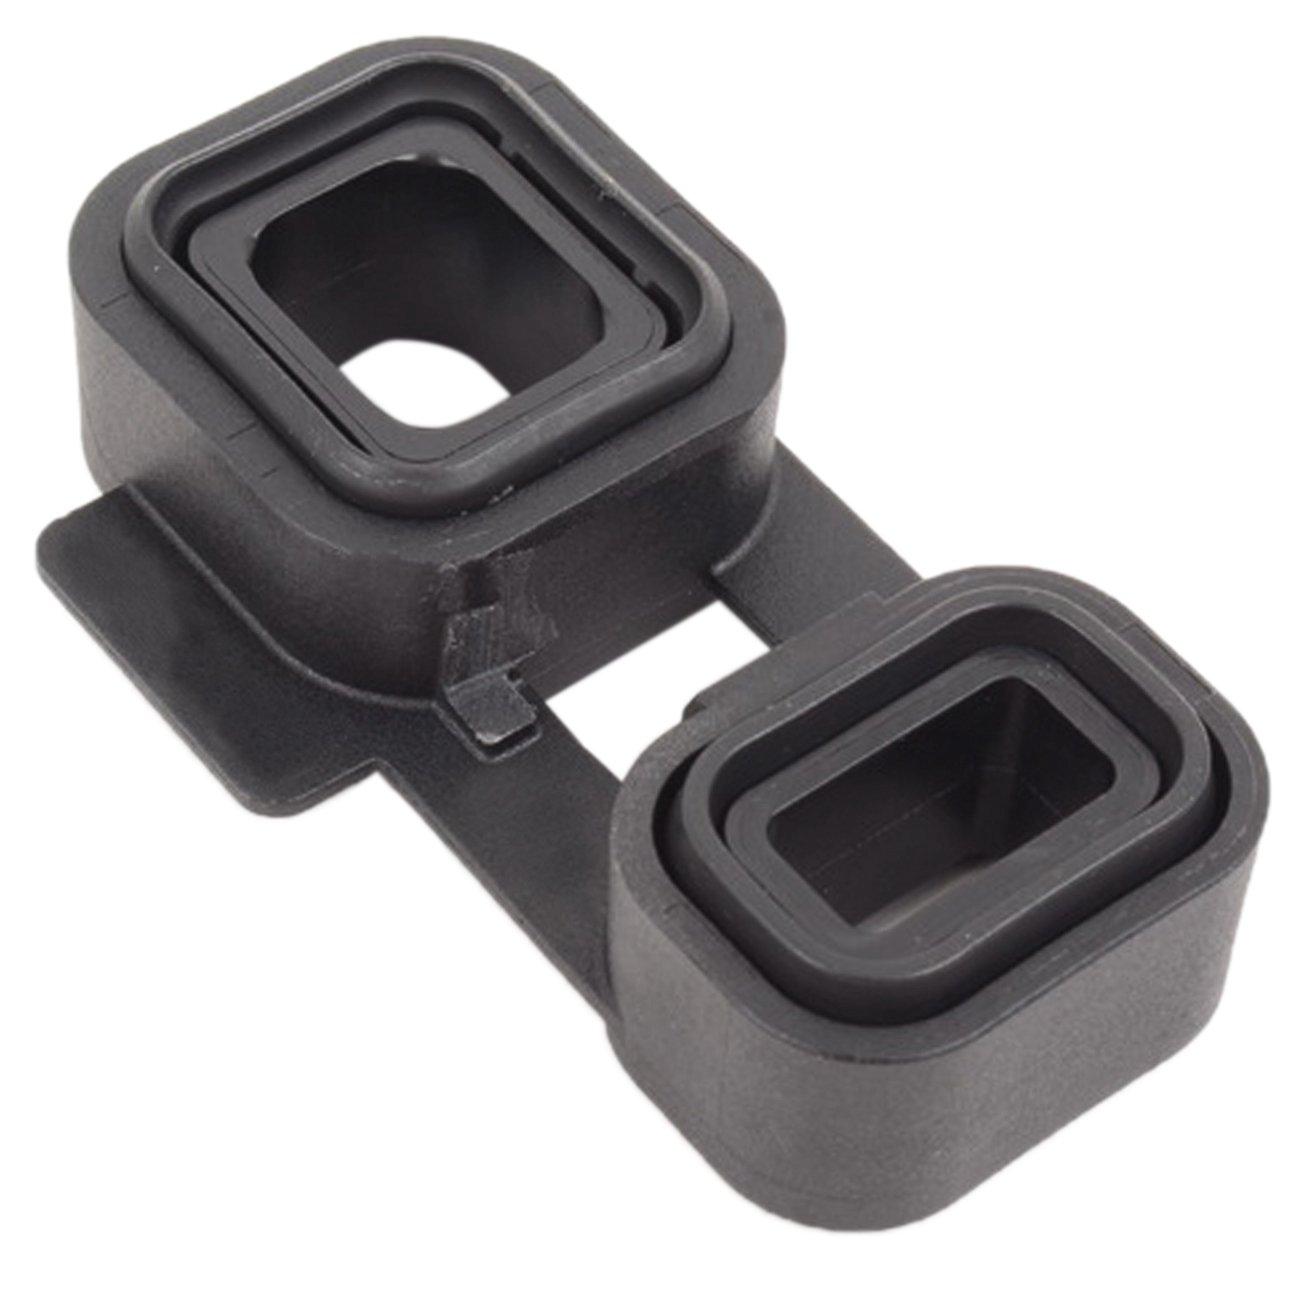 Bapmic 6HP26 6HP28 Auto Transmission Valve Body Adapter Seal for BMW E90 E91 E60 E65 X3 E83 X5 E53 E70